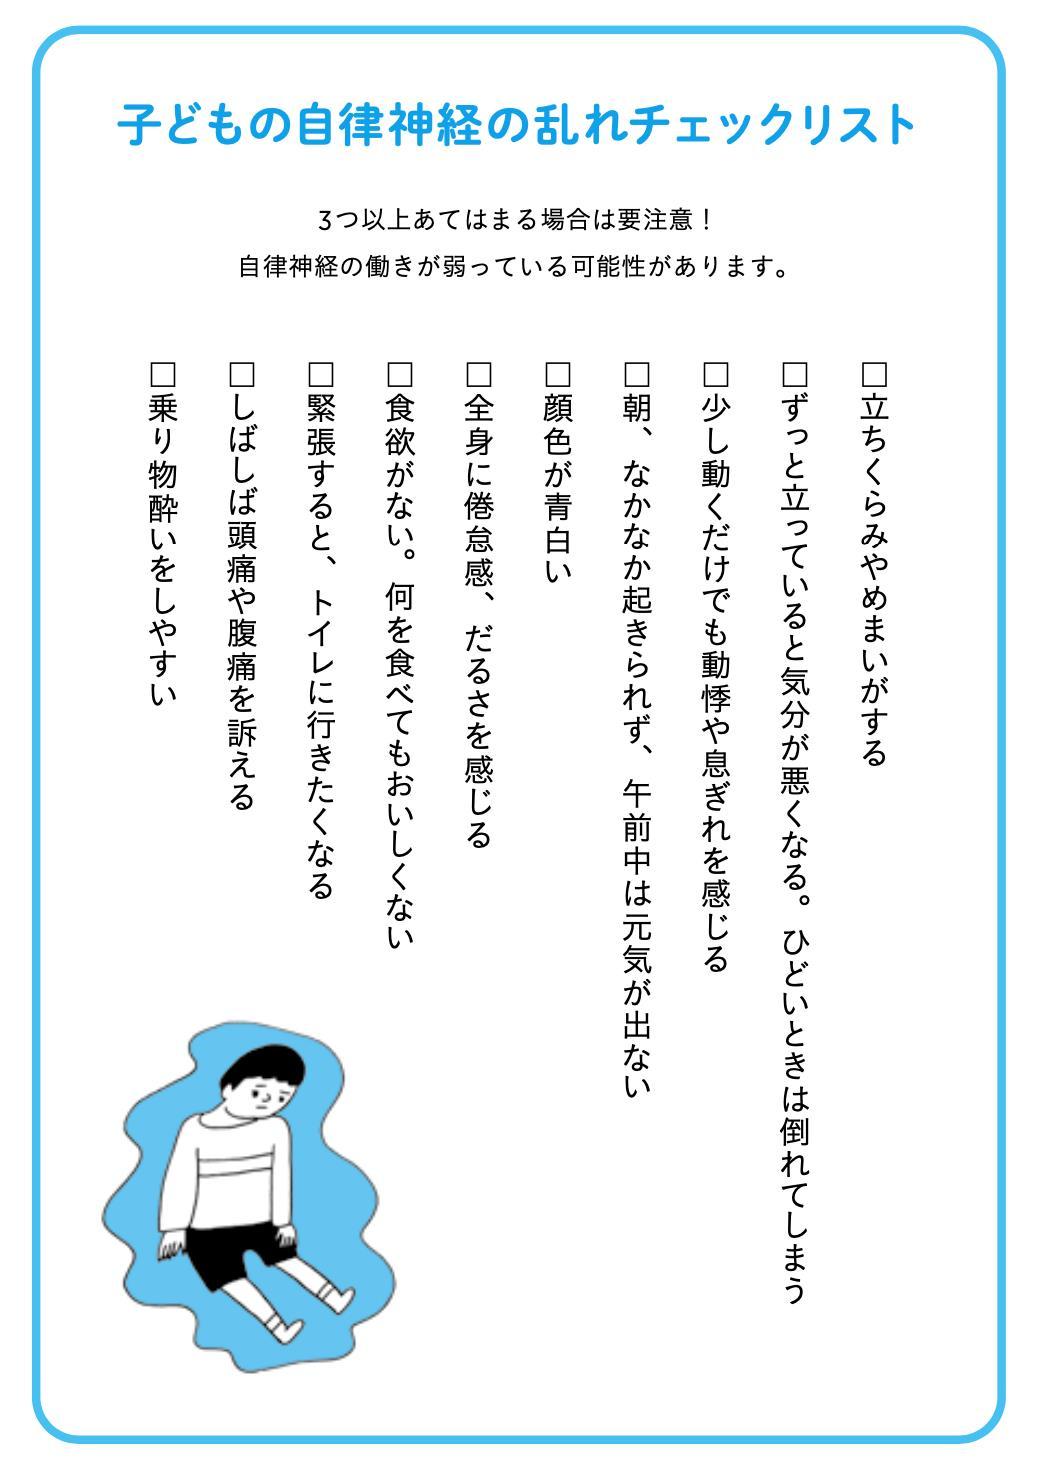 kodomoiikoto_sub1.jpg